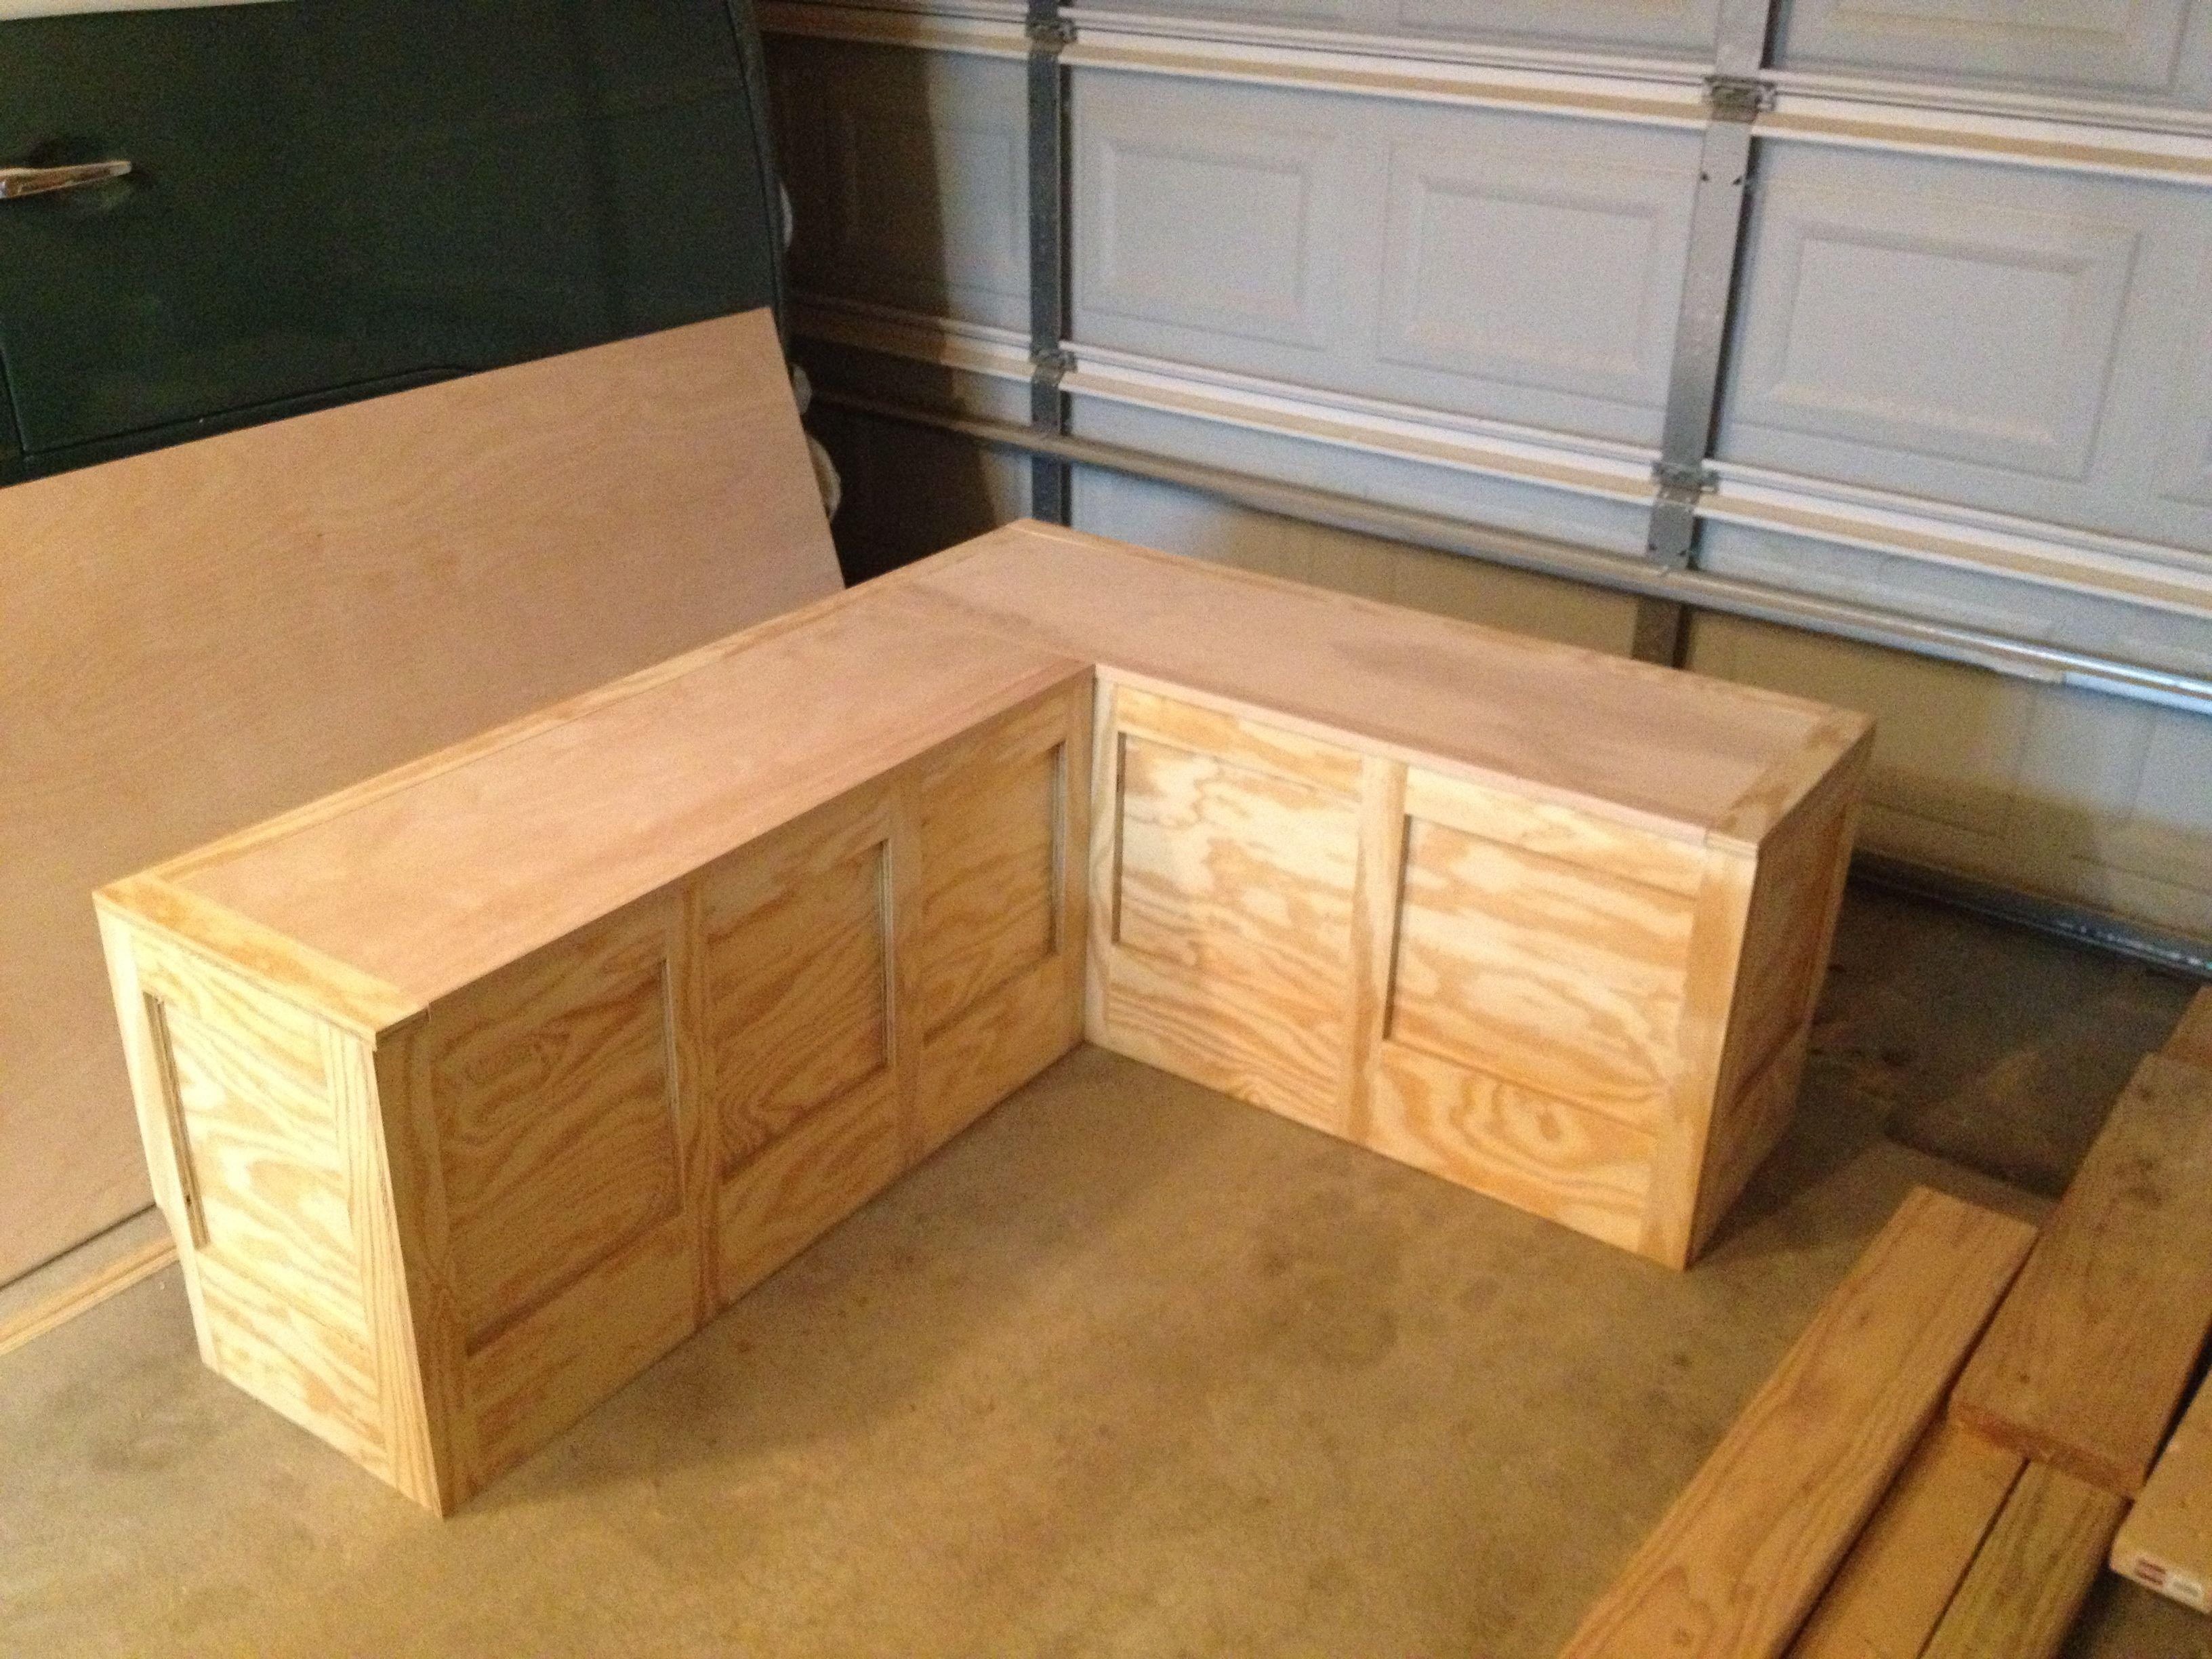 Custom Corner Bench Toy Box | For the Home | Pinterest ...